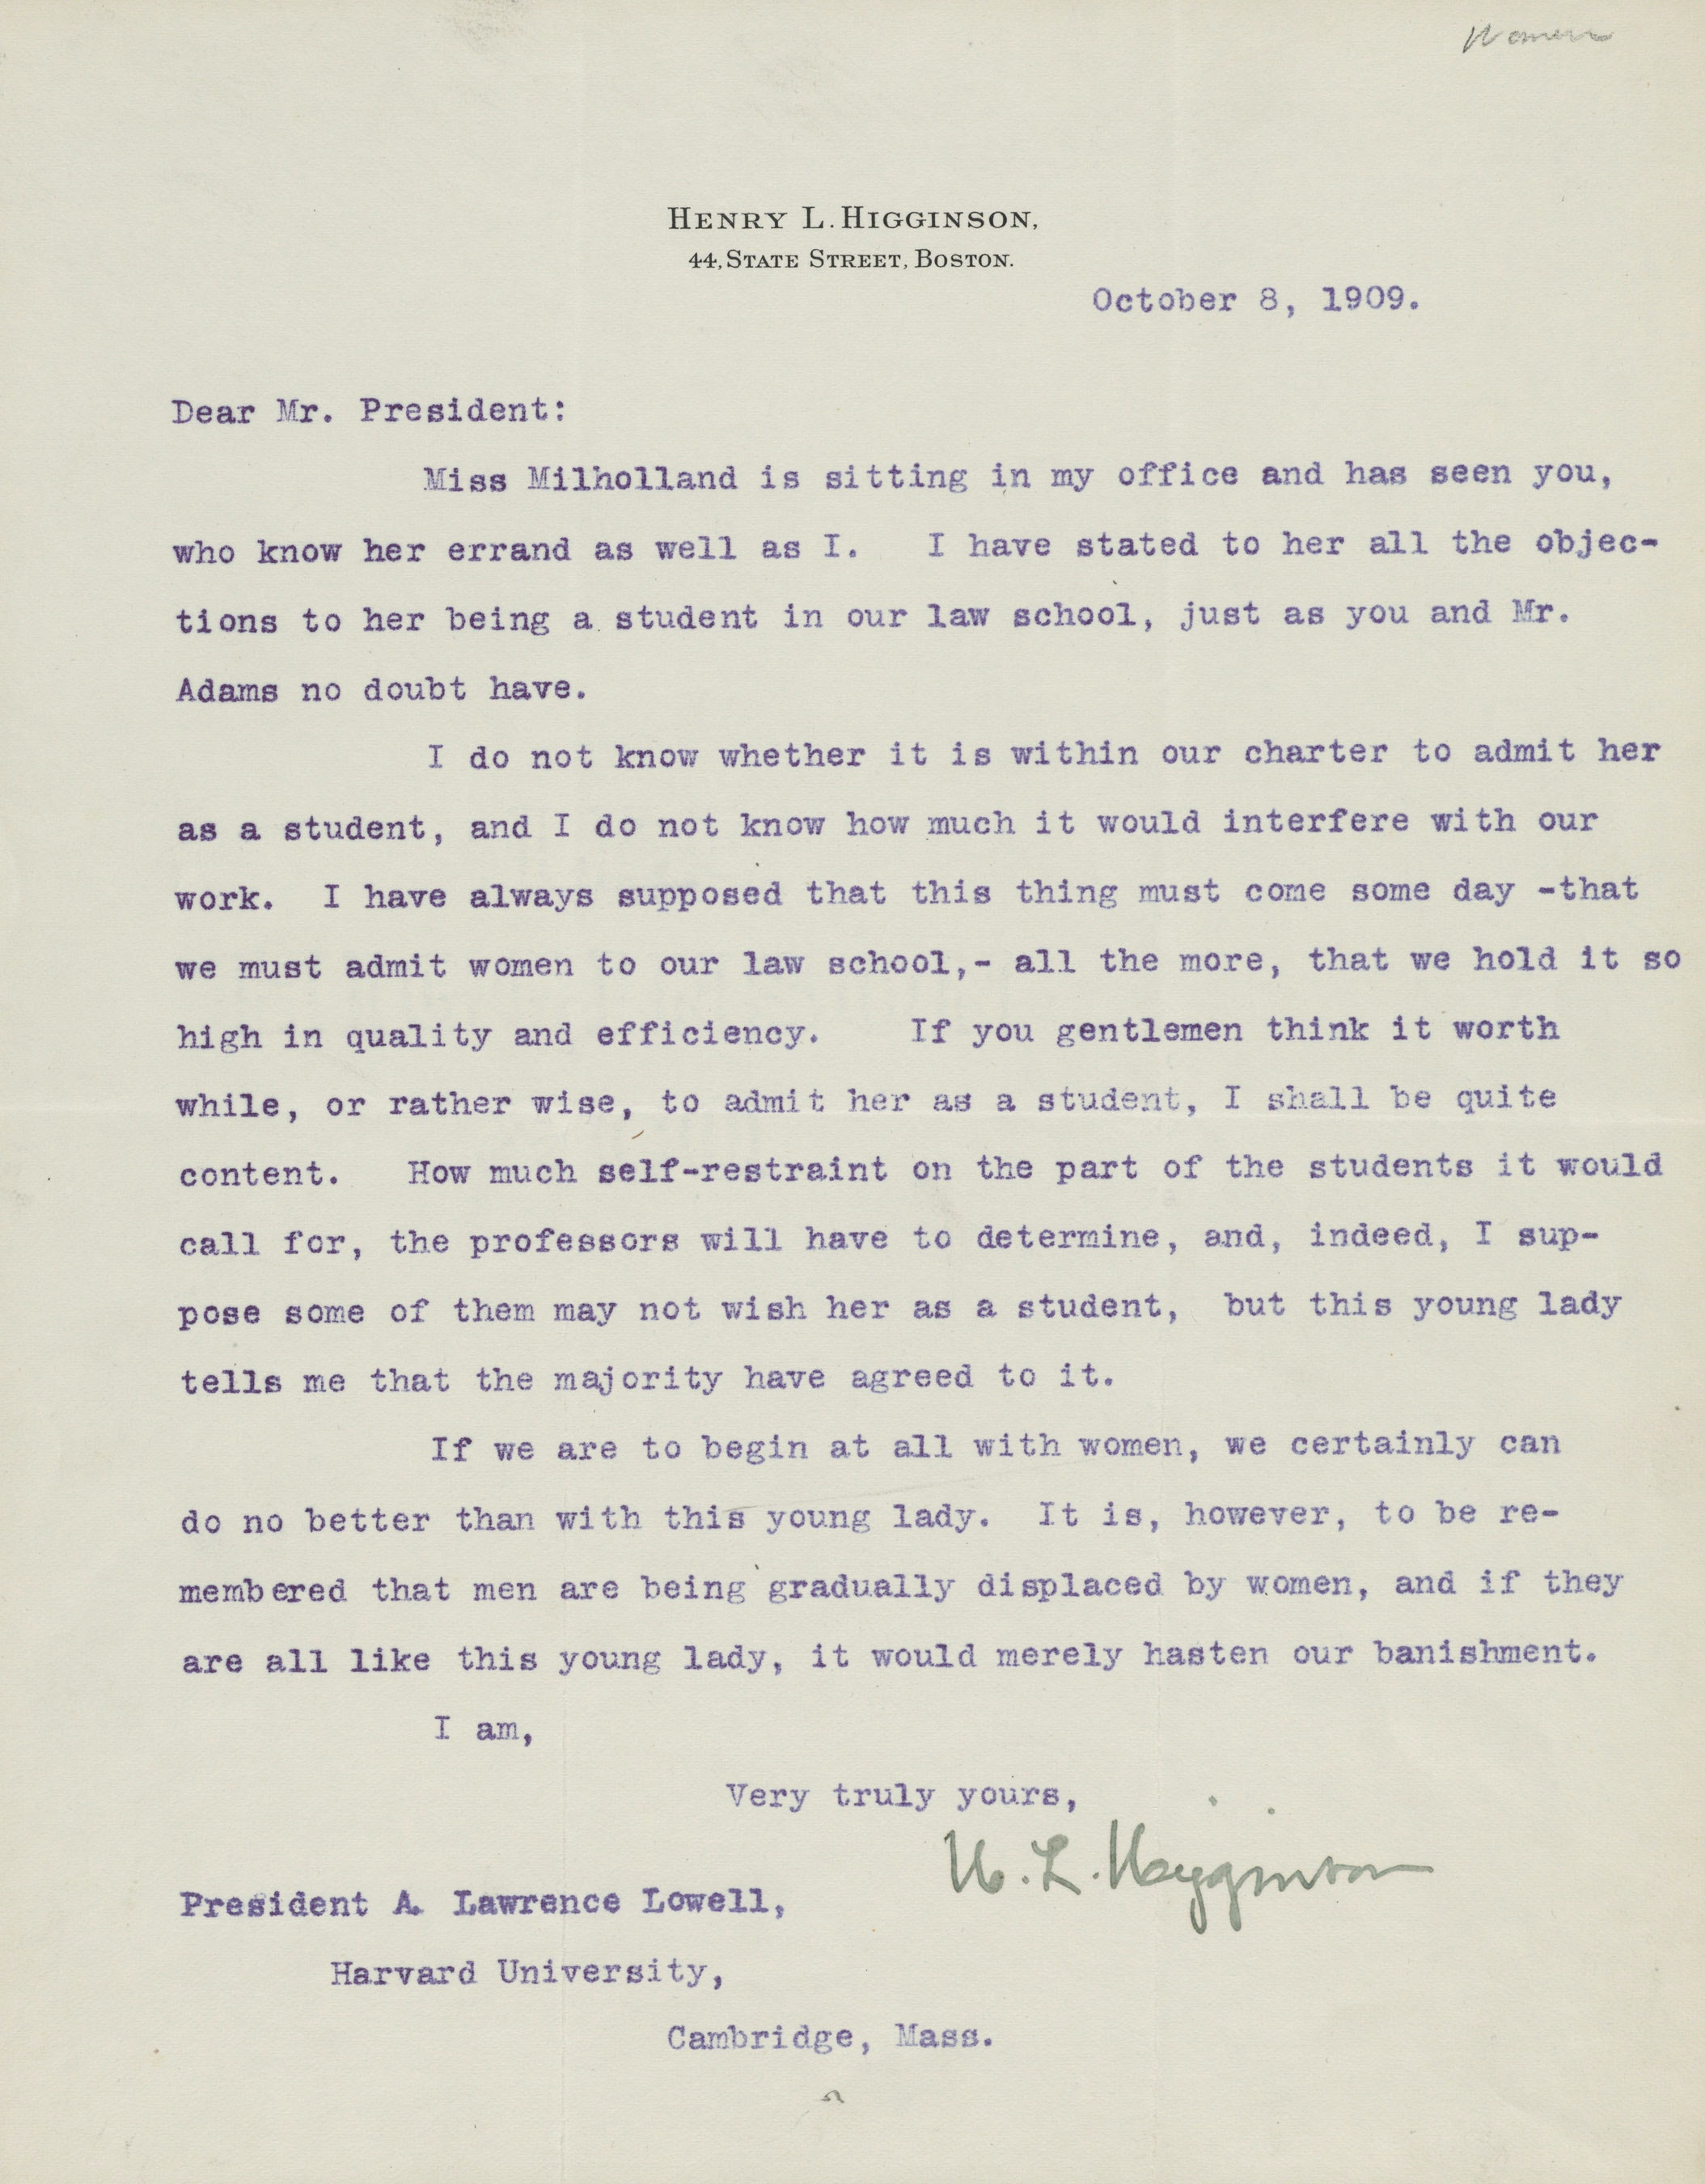 Letter regarding Inez Milholland